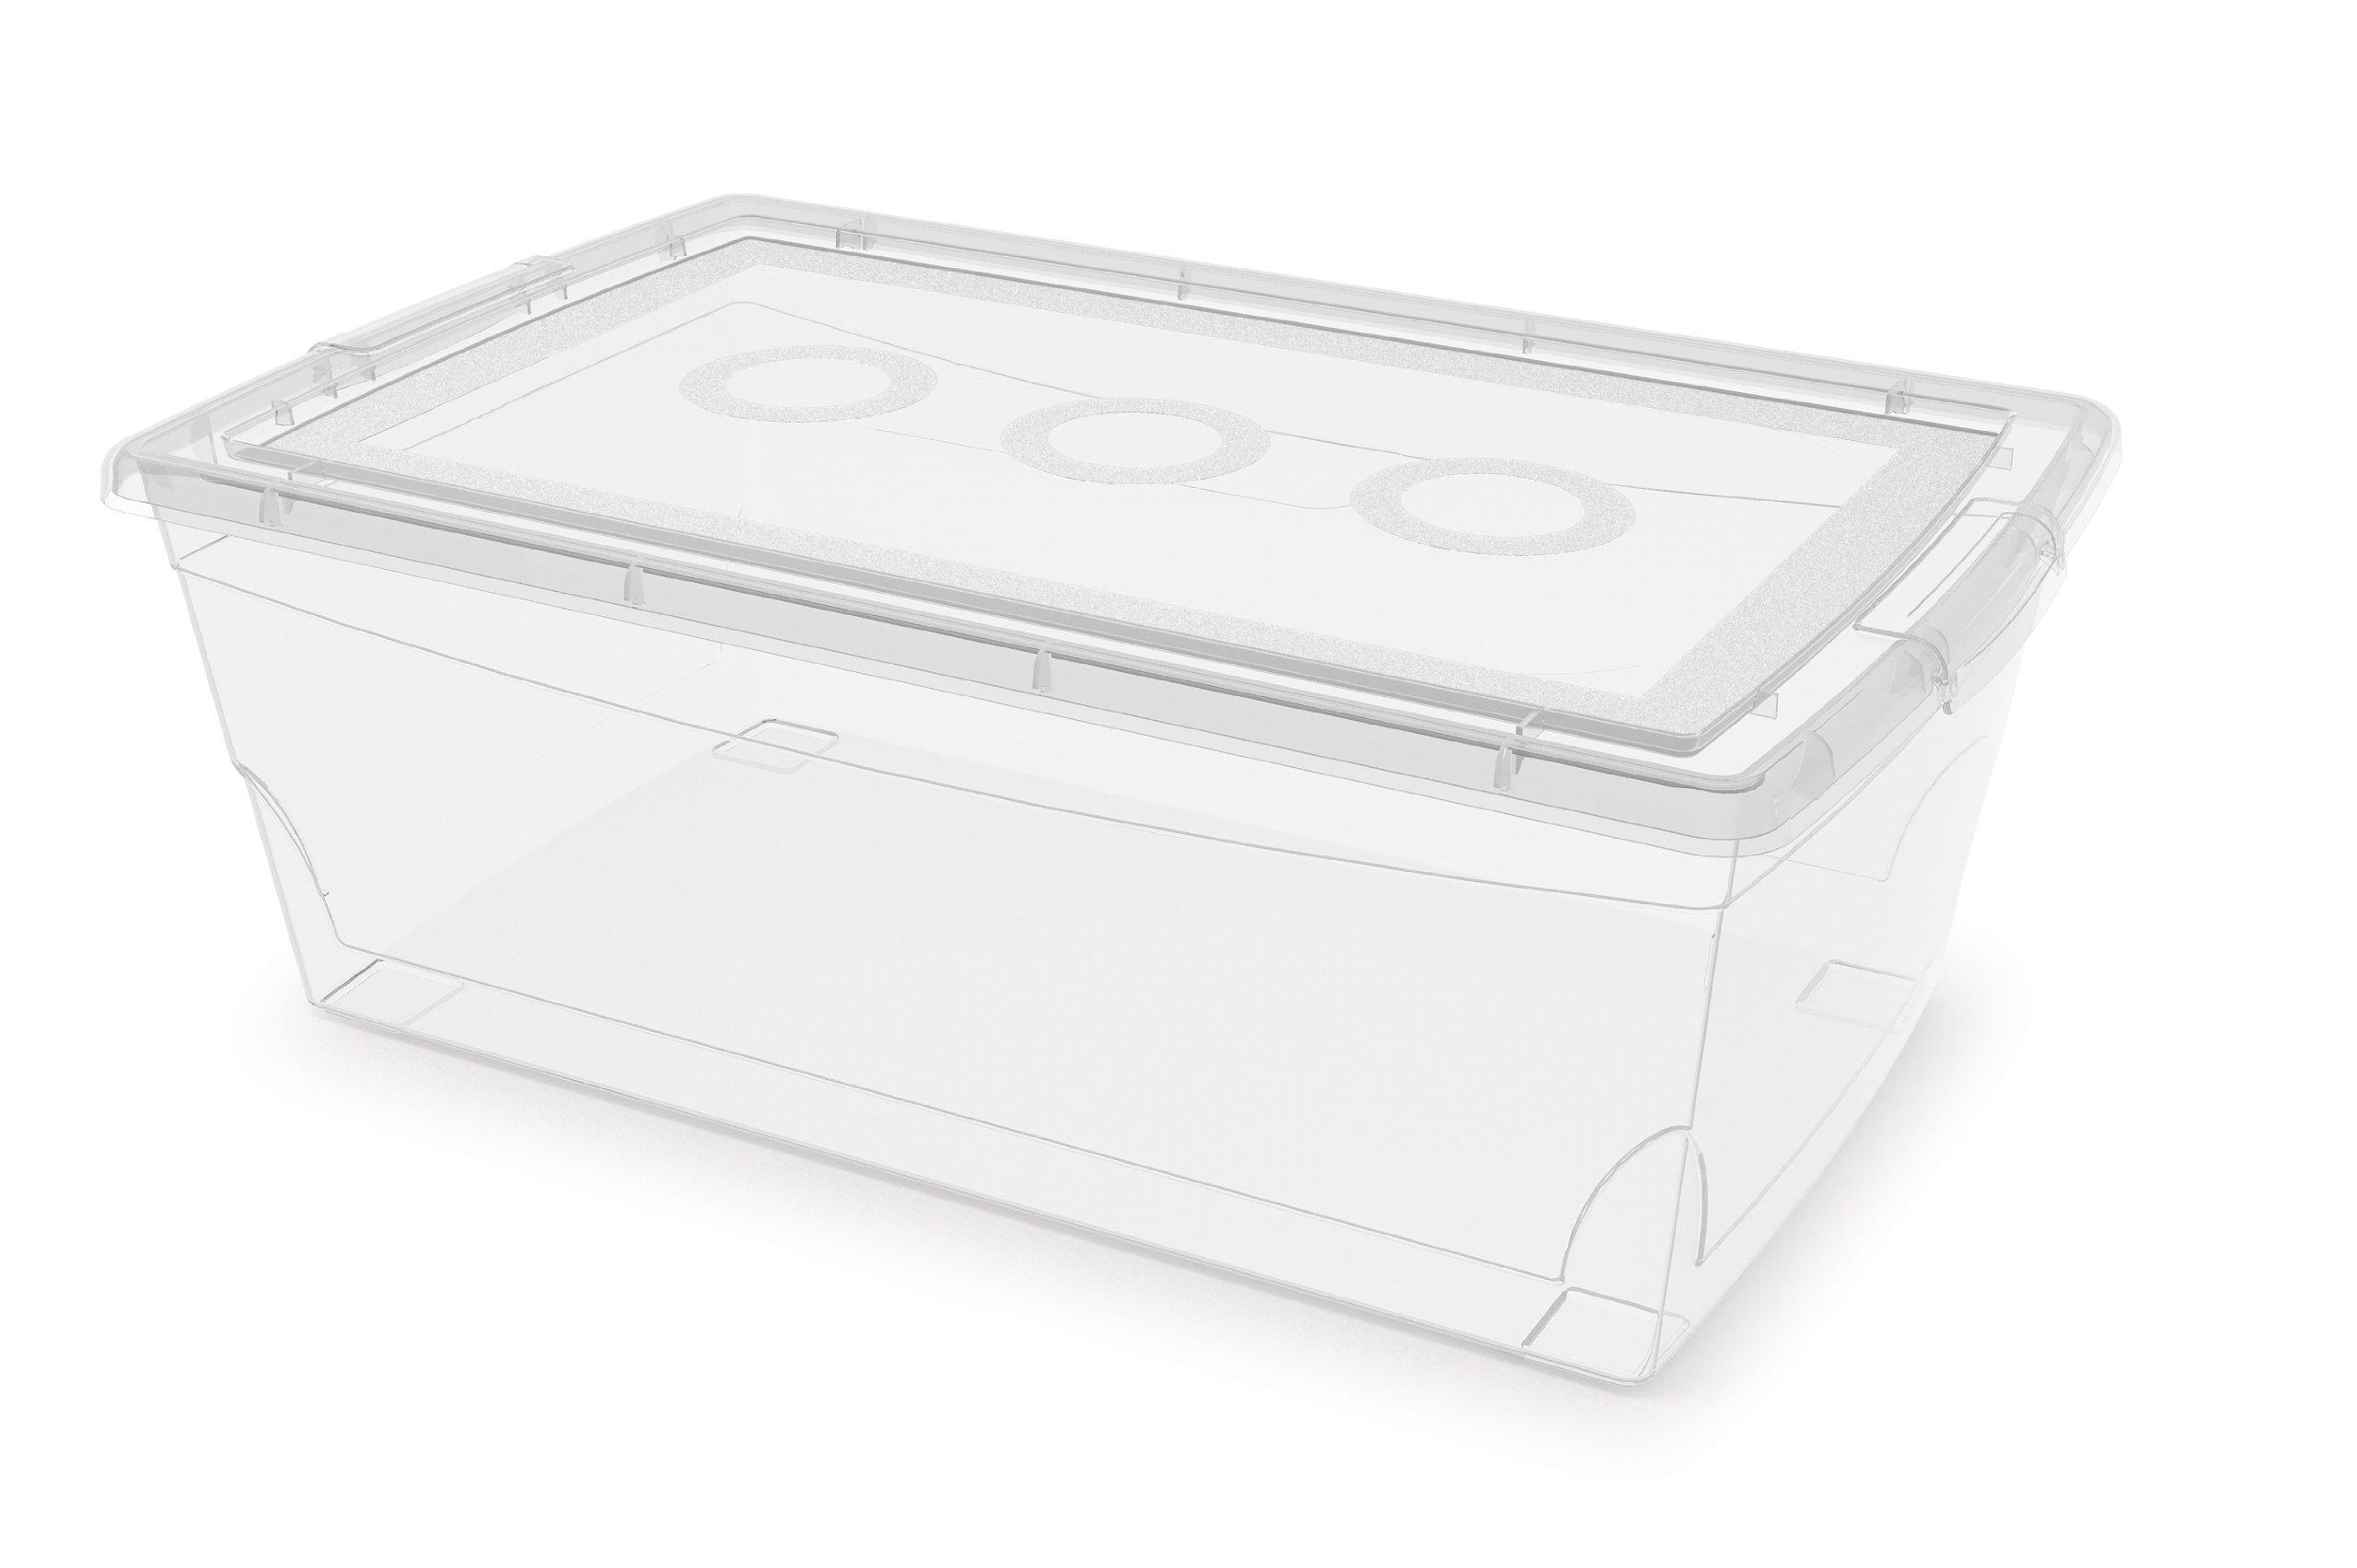 6.5-Quart//6-Liter KIS Clear Omni Shoe Box 9-Pack